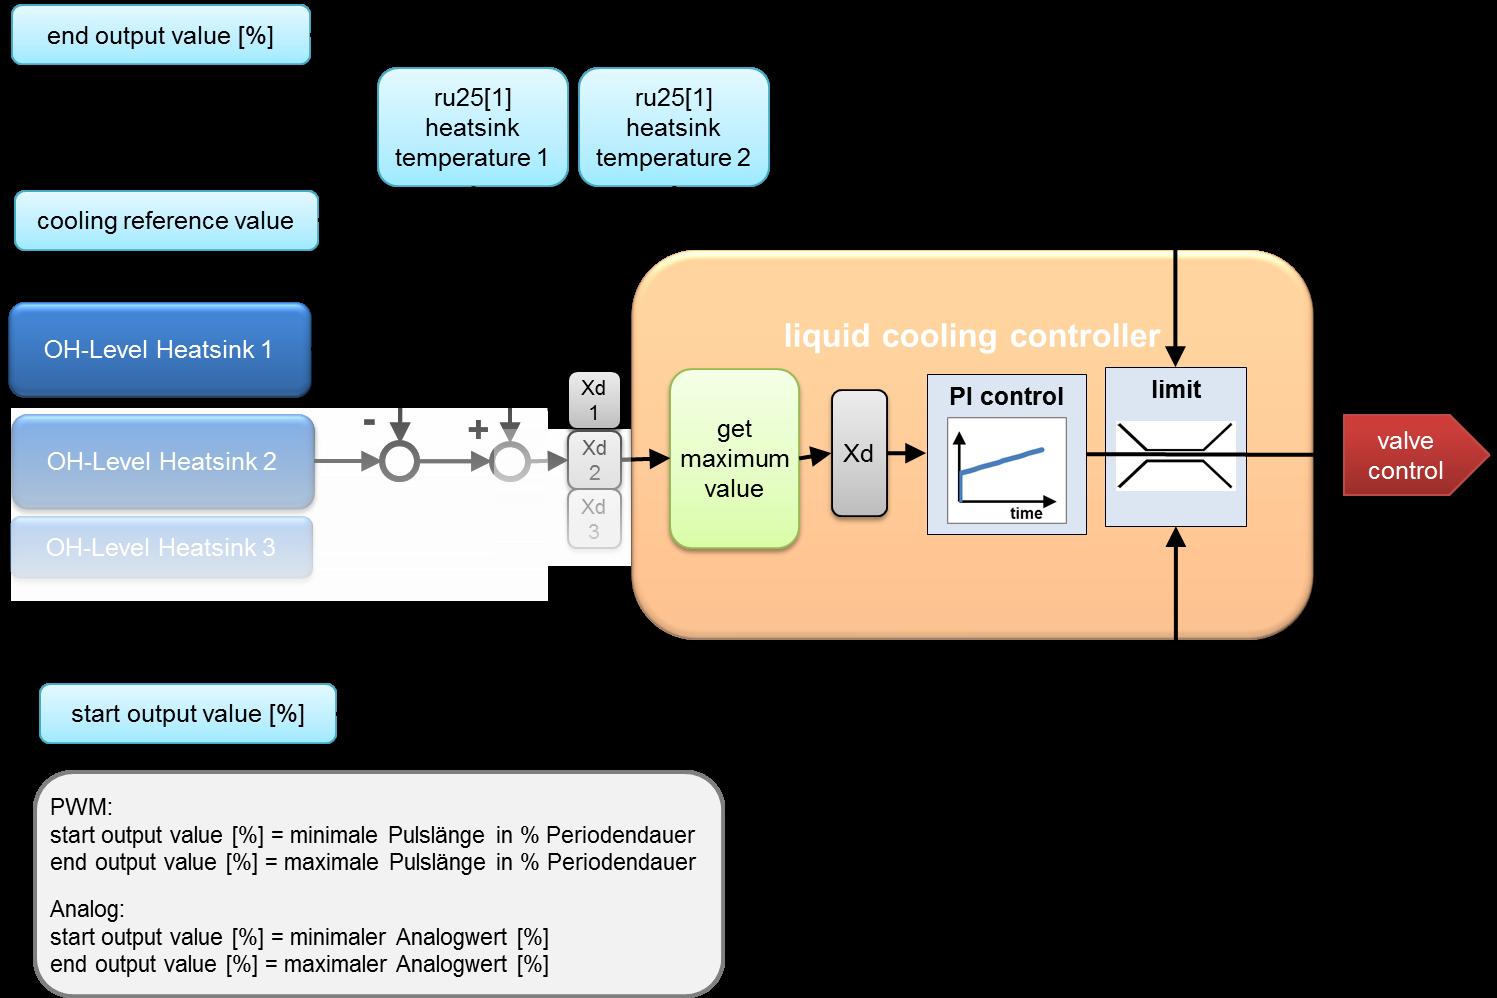 VFD flow control diagram